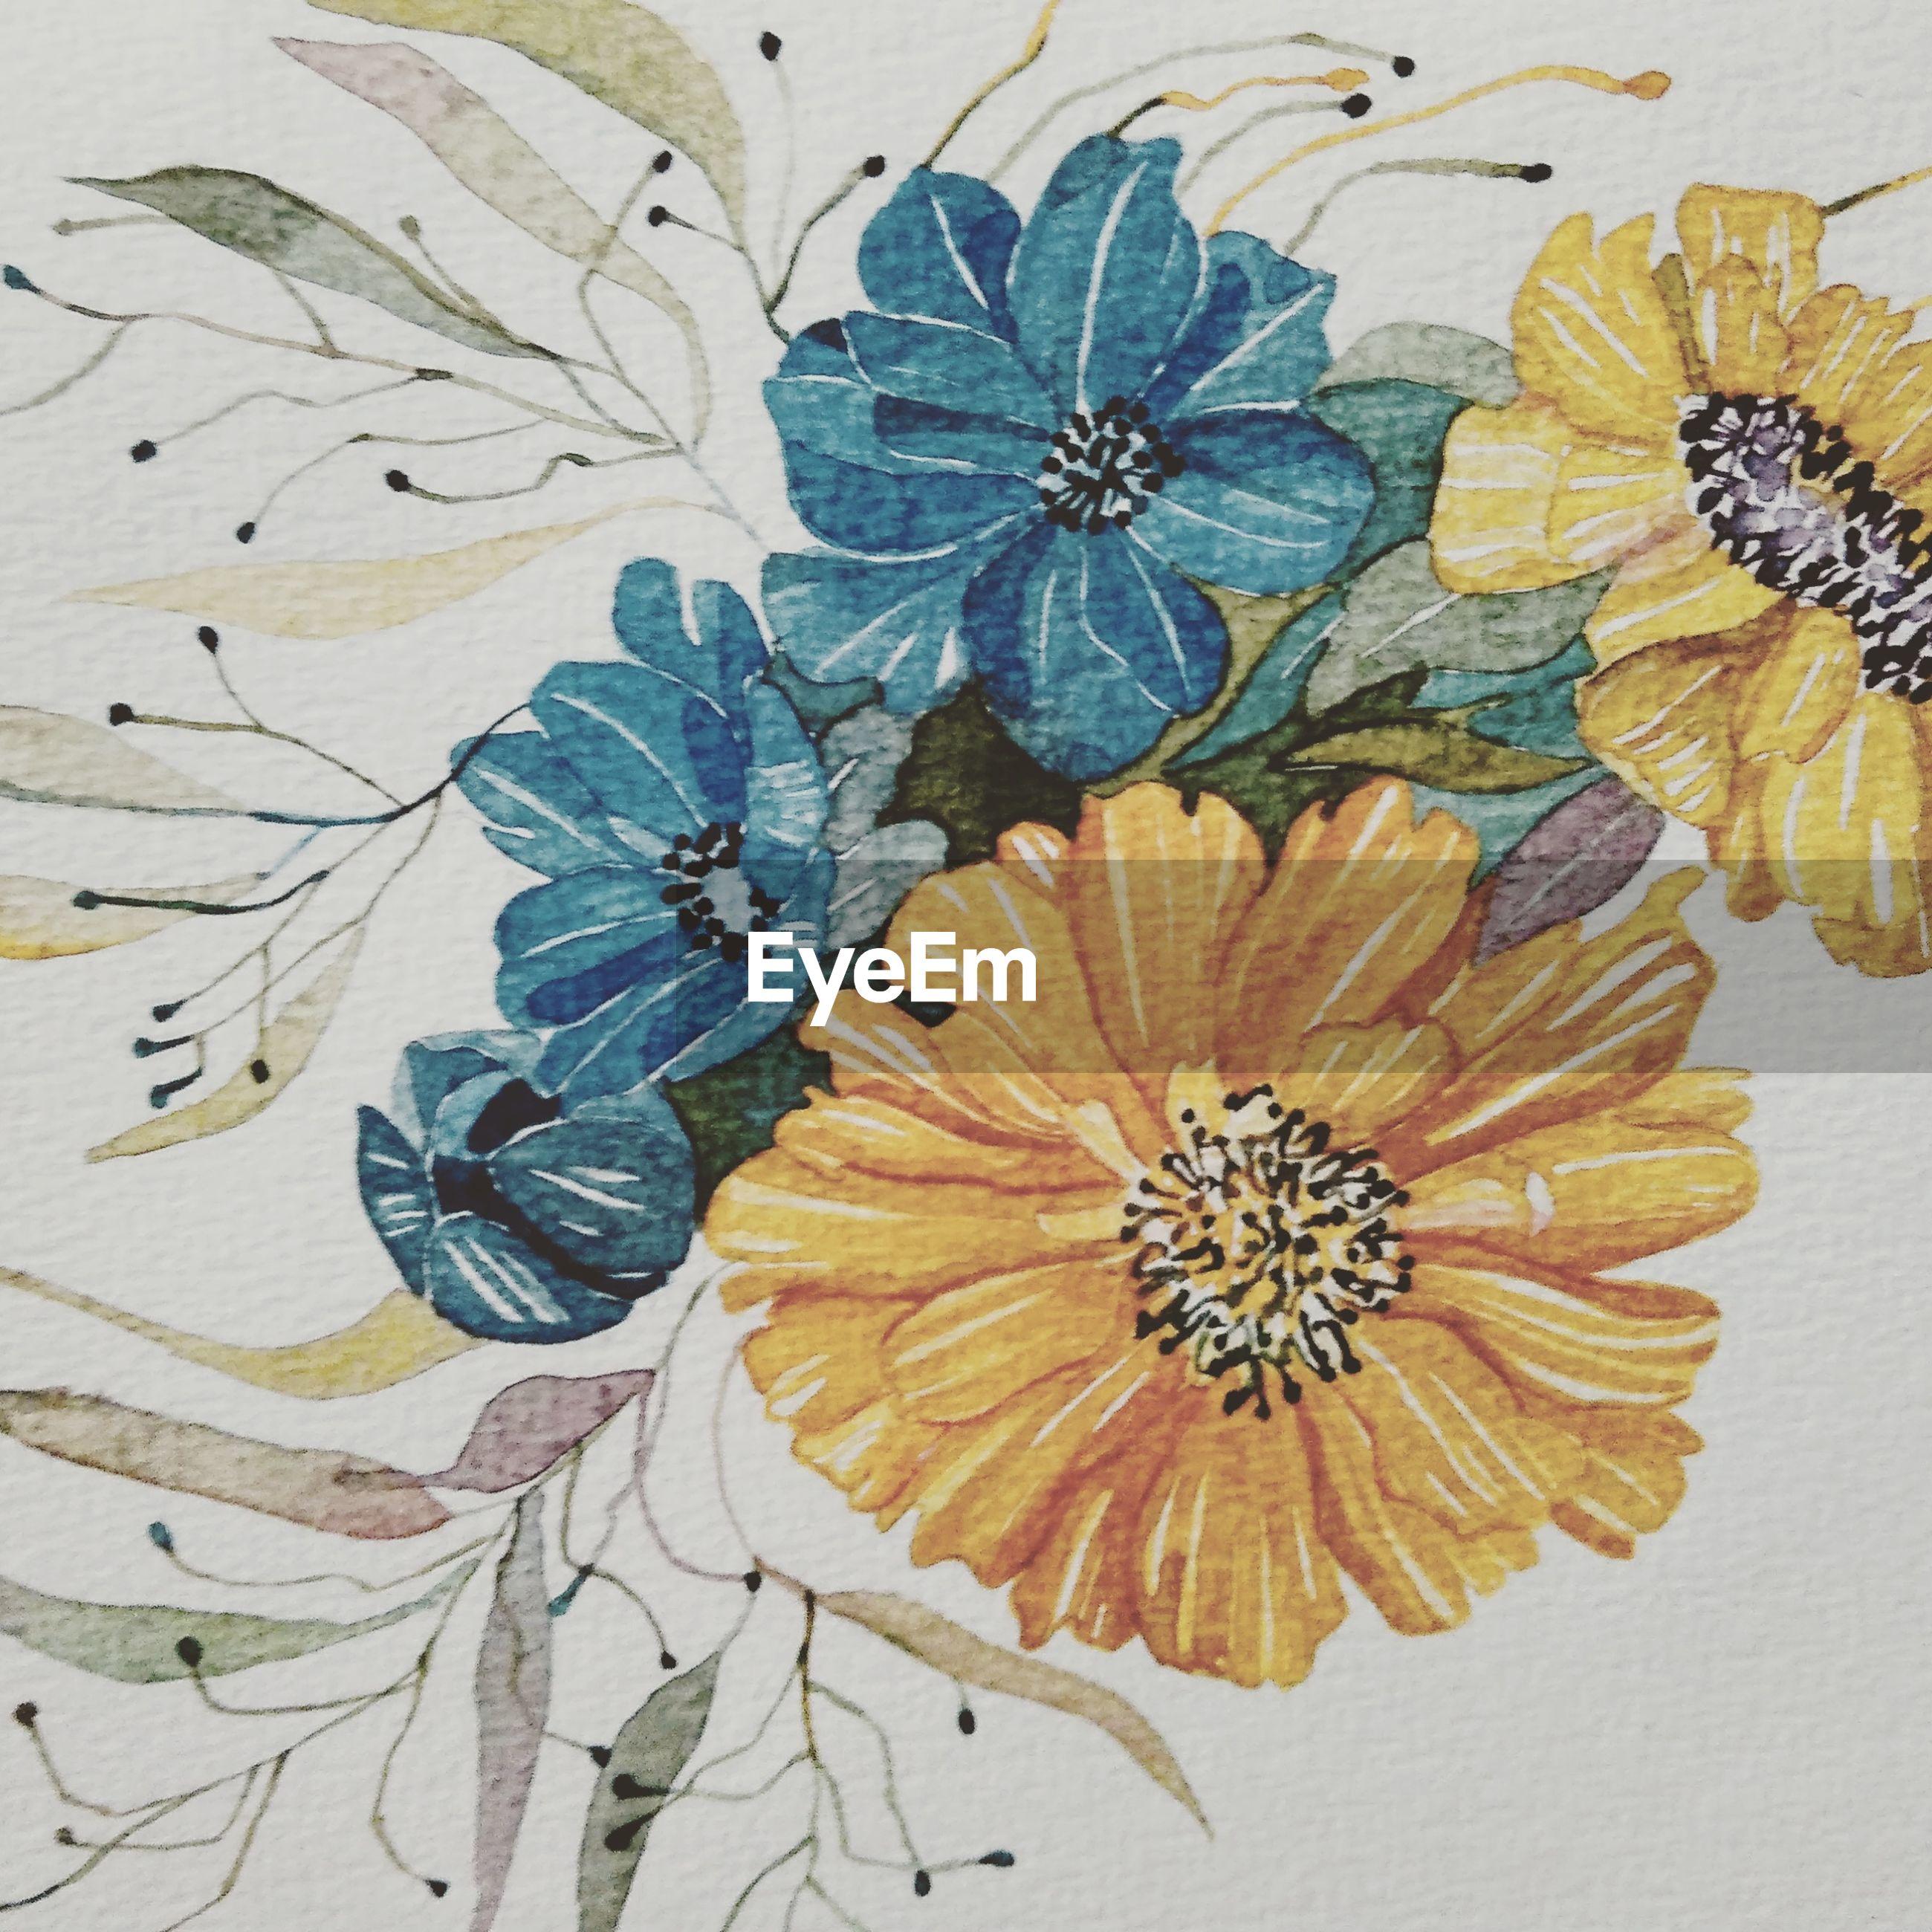 flower, close-up, freshness, flower head, petal, design, creativity, fragility, flower arrangement, springtime, vibrant color, single flower, pollen, blossom, full frame